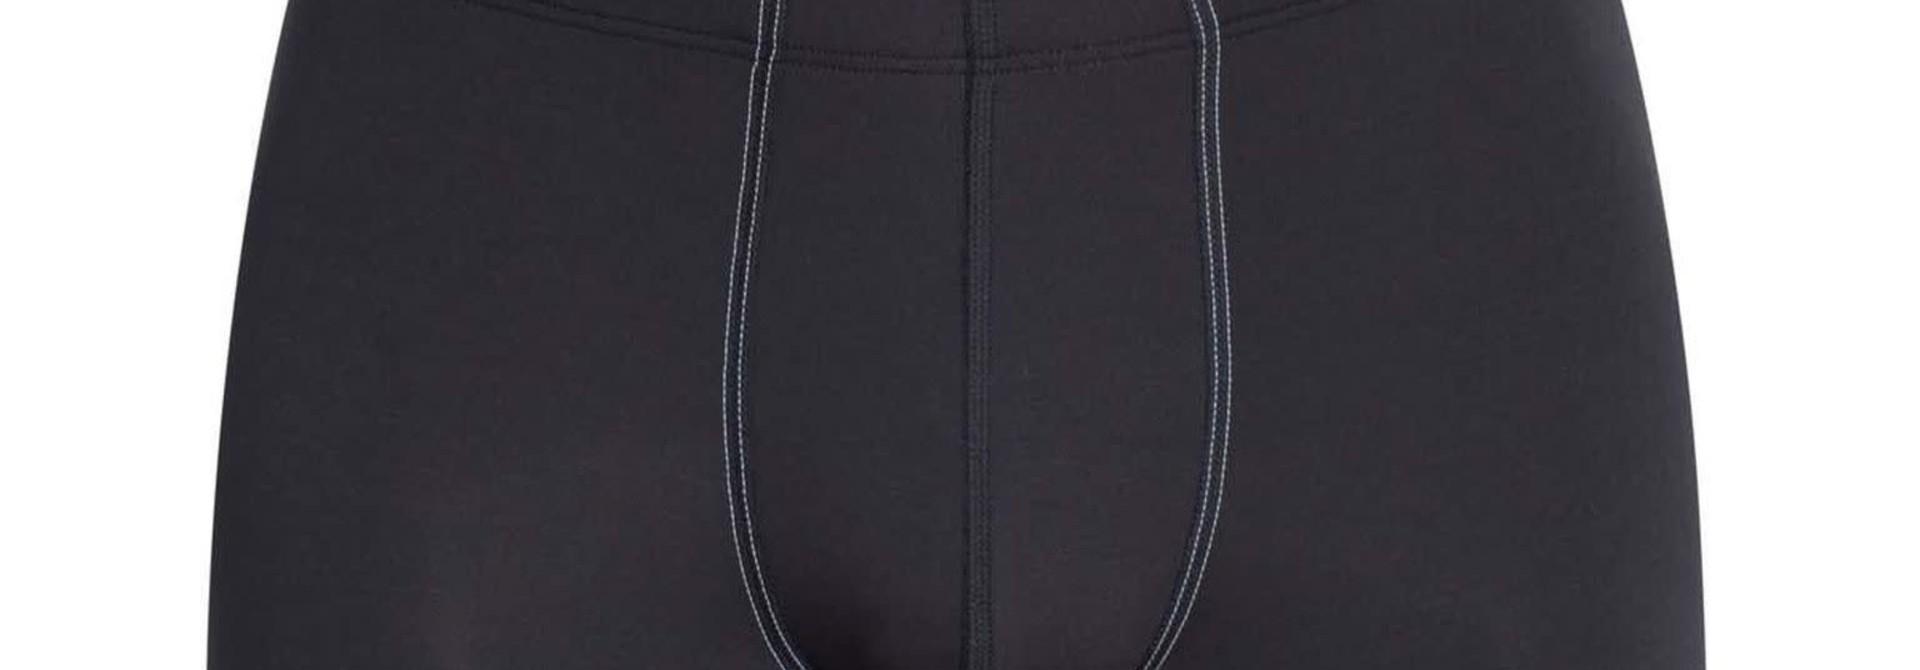 Short Basic Soft 10167209 - zwart